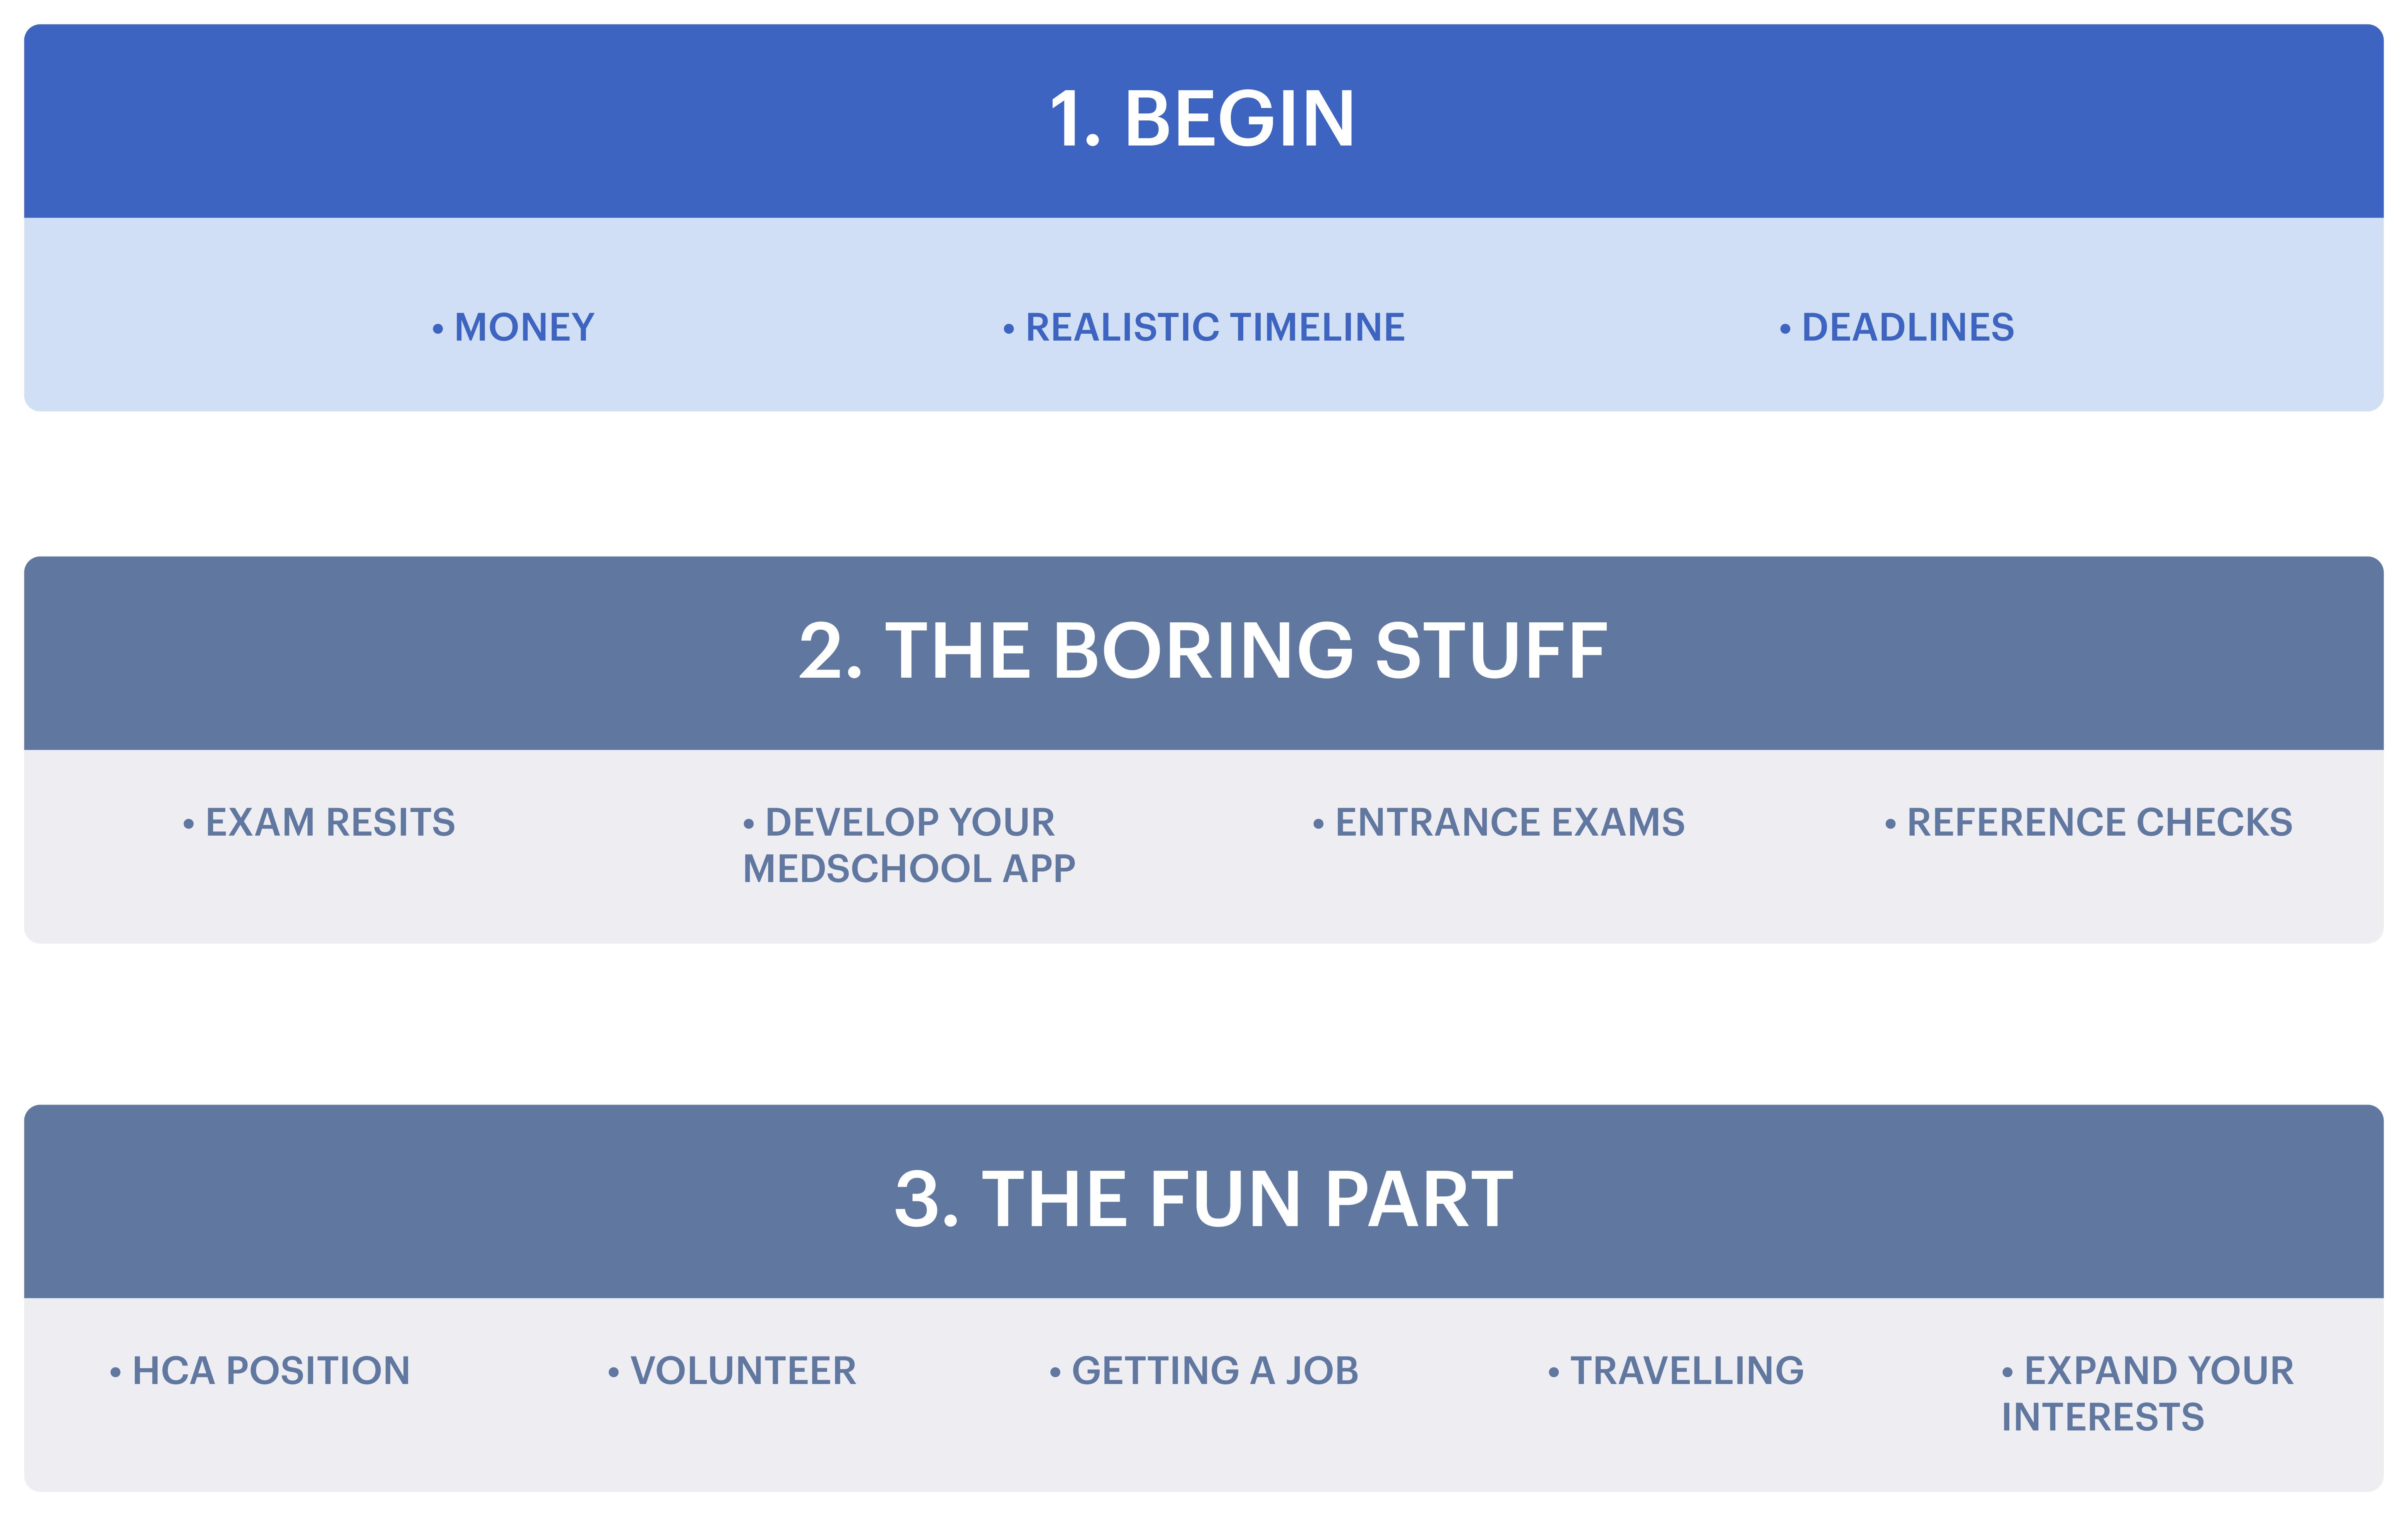 Step 1 Begin: Money, Realistic Timeline, Deadlines